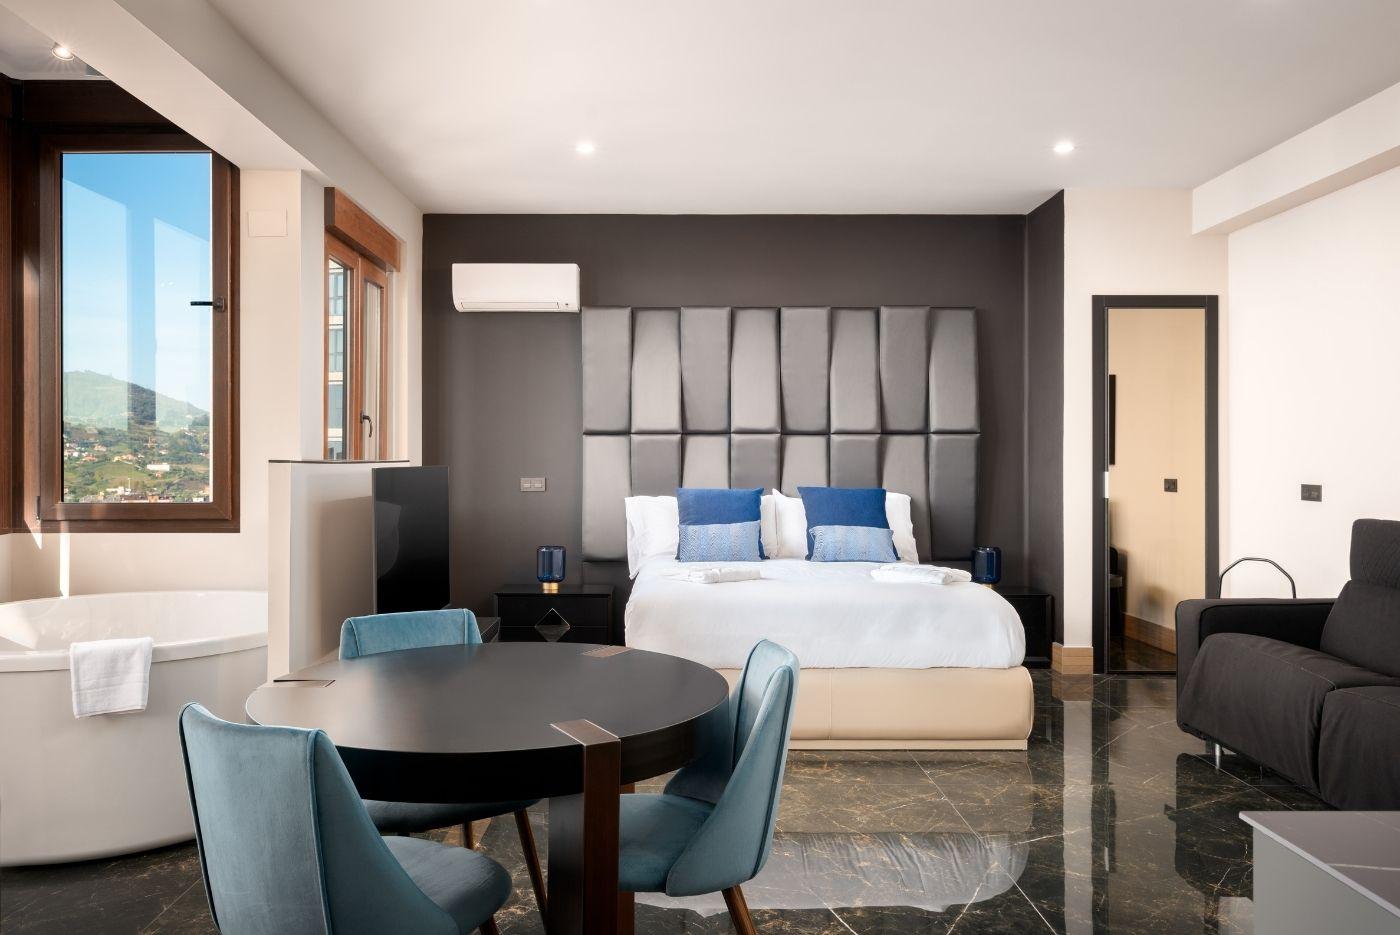 Apartamento-Suite-Deluxe-71-Oviedo-1907-01